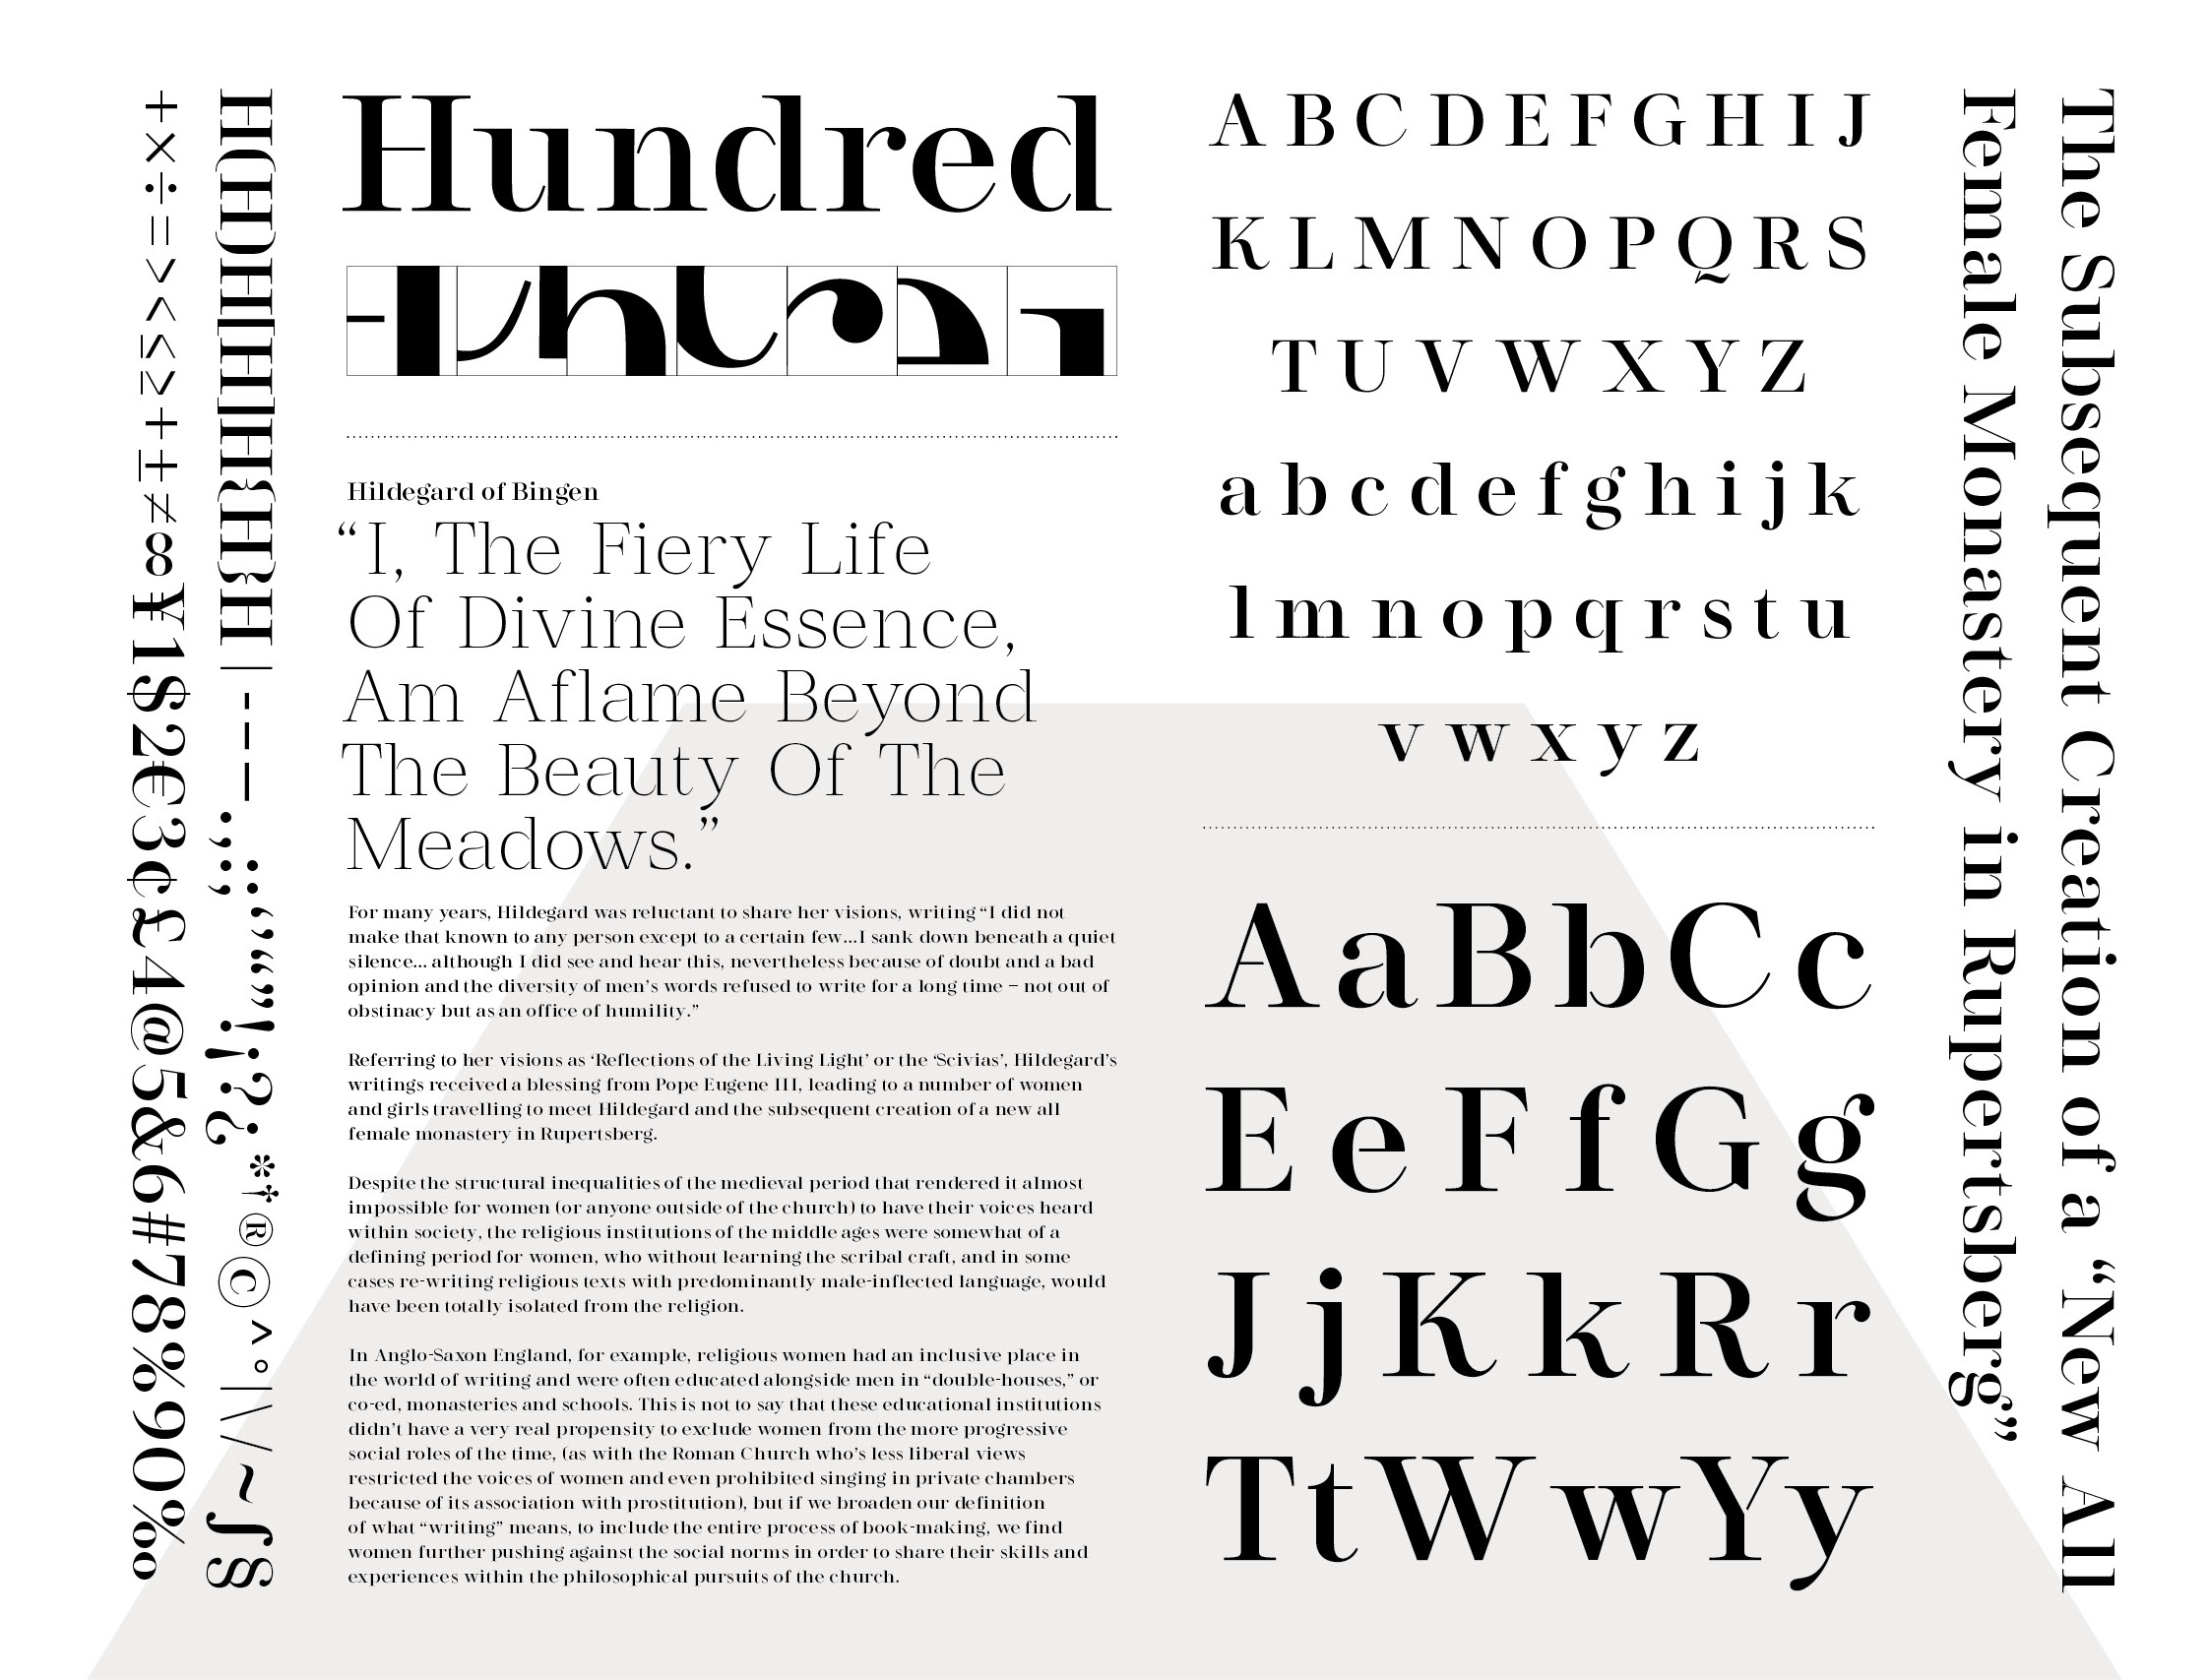 Opuntia Display Font Design - yuansudesign